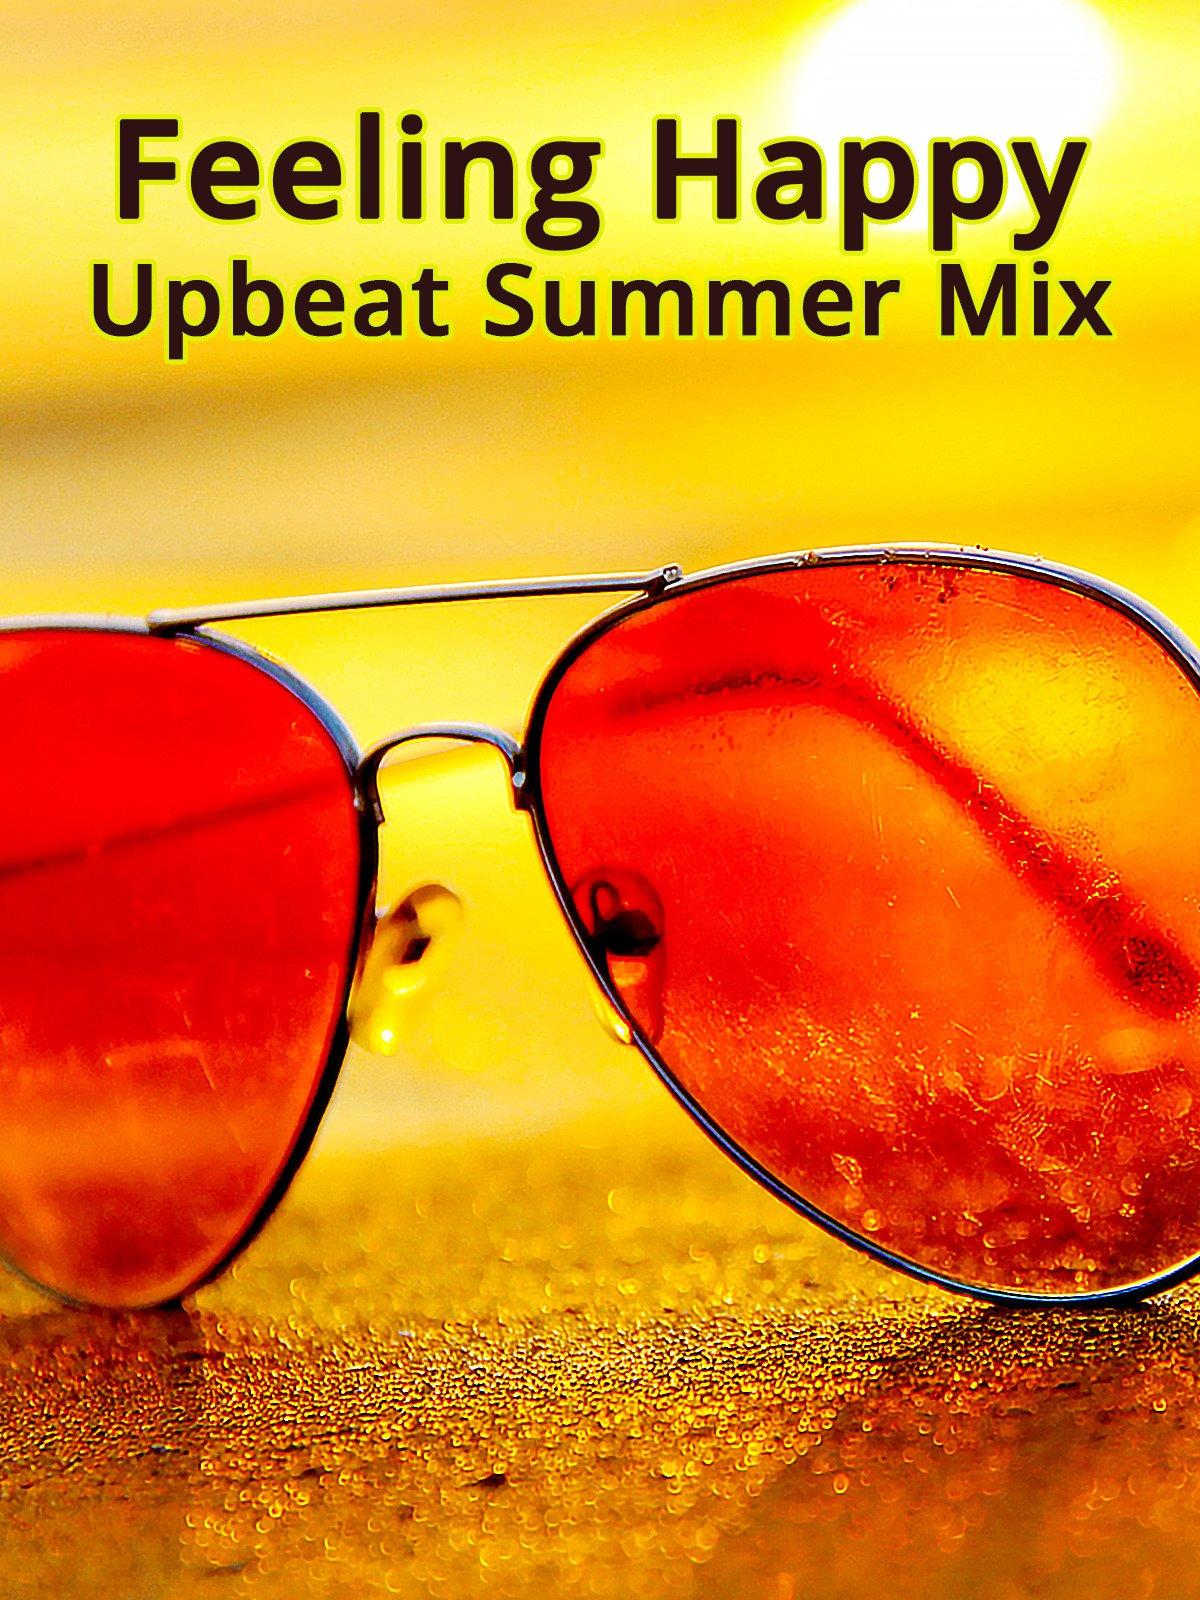 Feeling Happy Upbeat Summer Mix